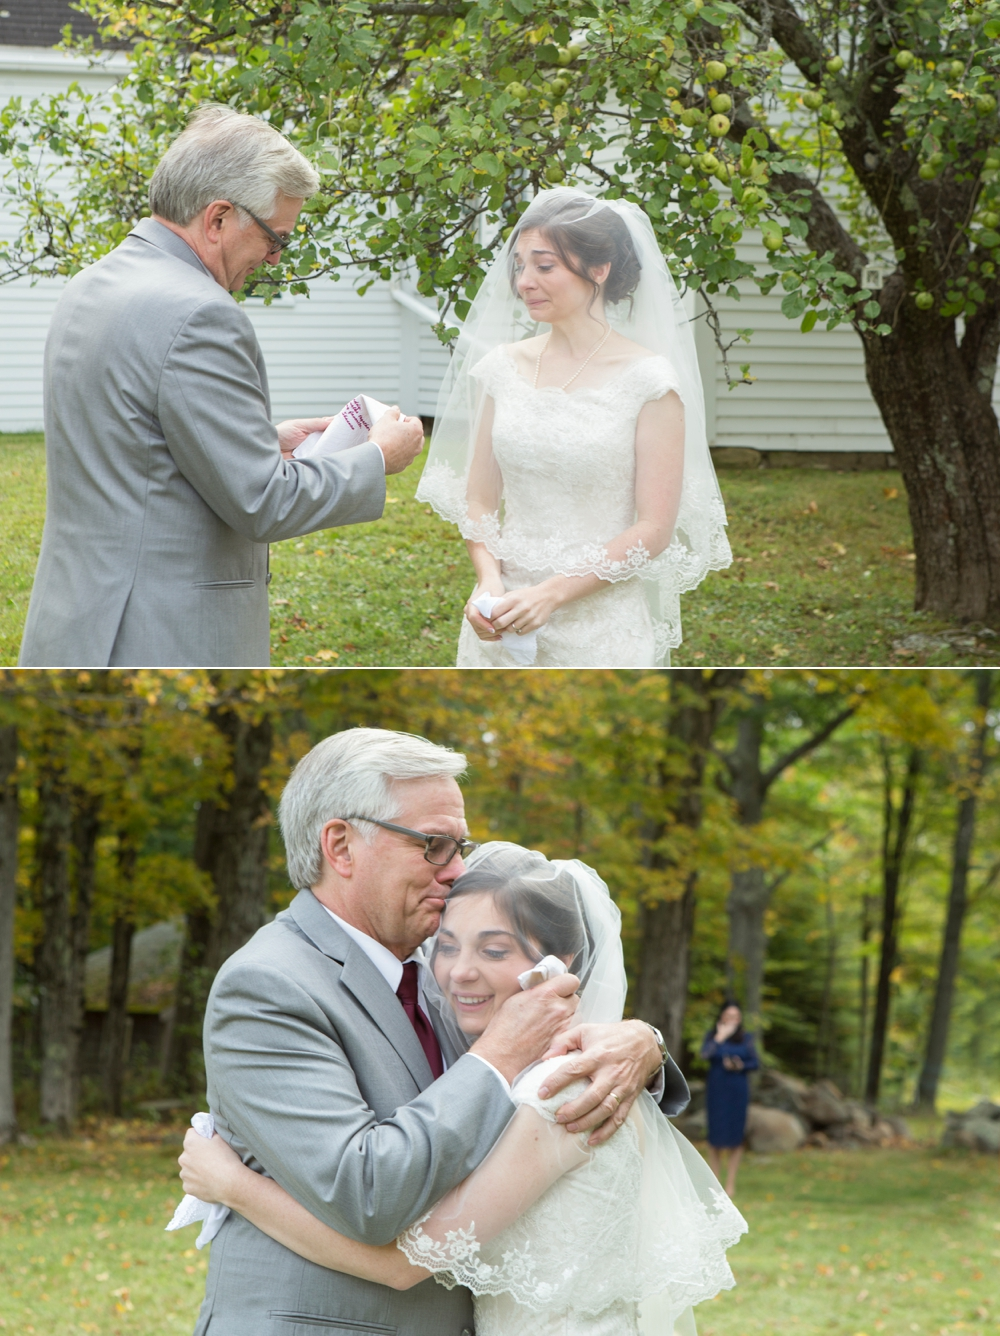 PrivateEstate_Wedding_Dan&Shannon_0007.jpg